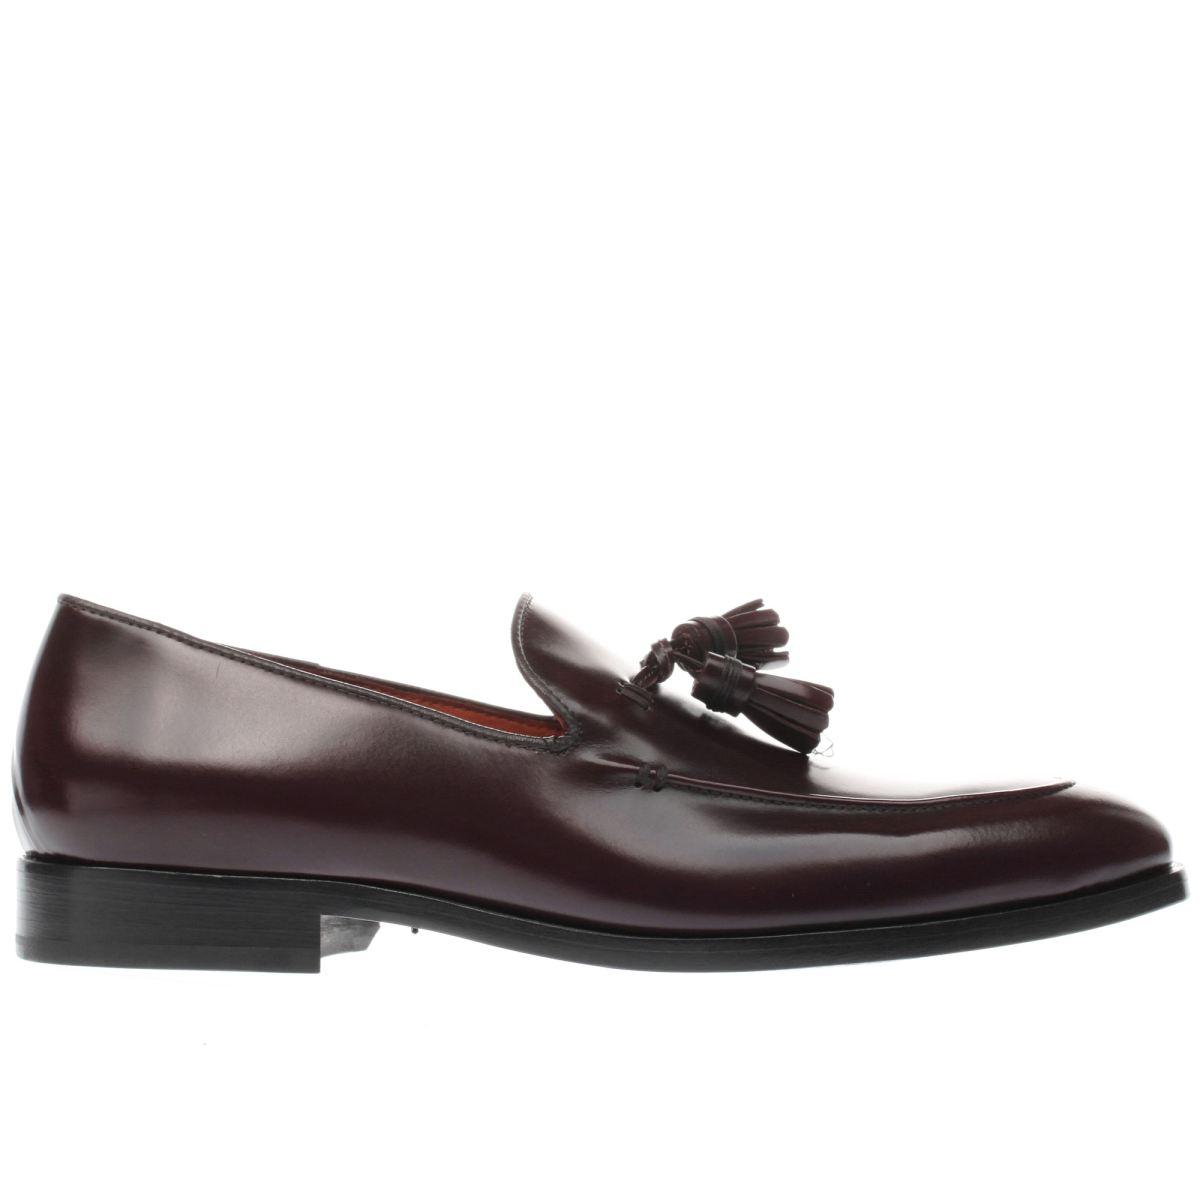 paul smith shoe ps burgundy elgin shoes